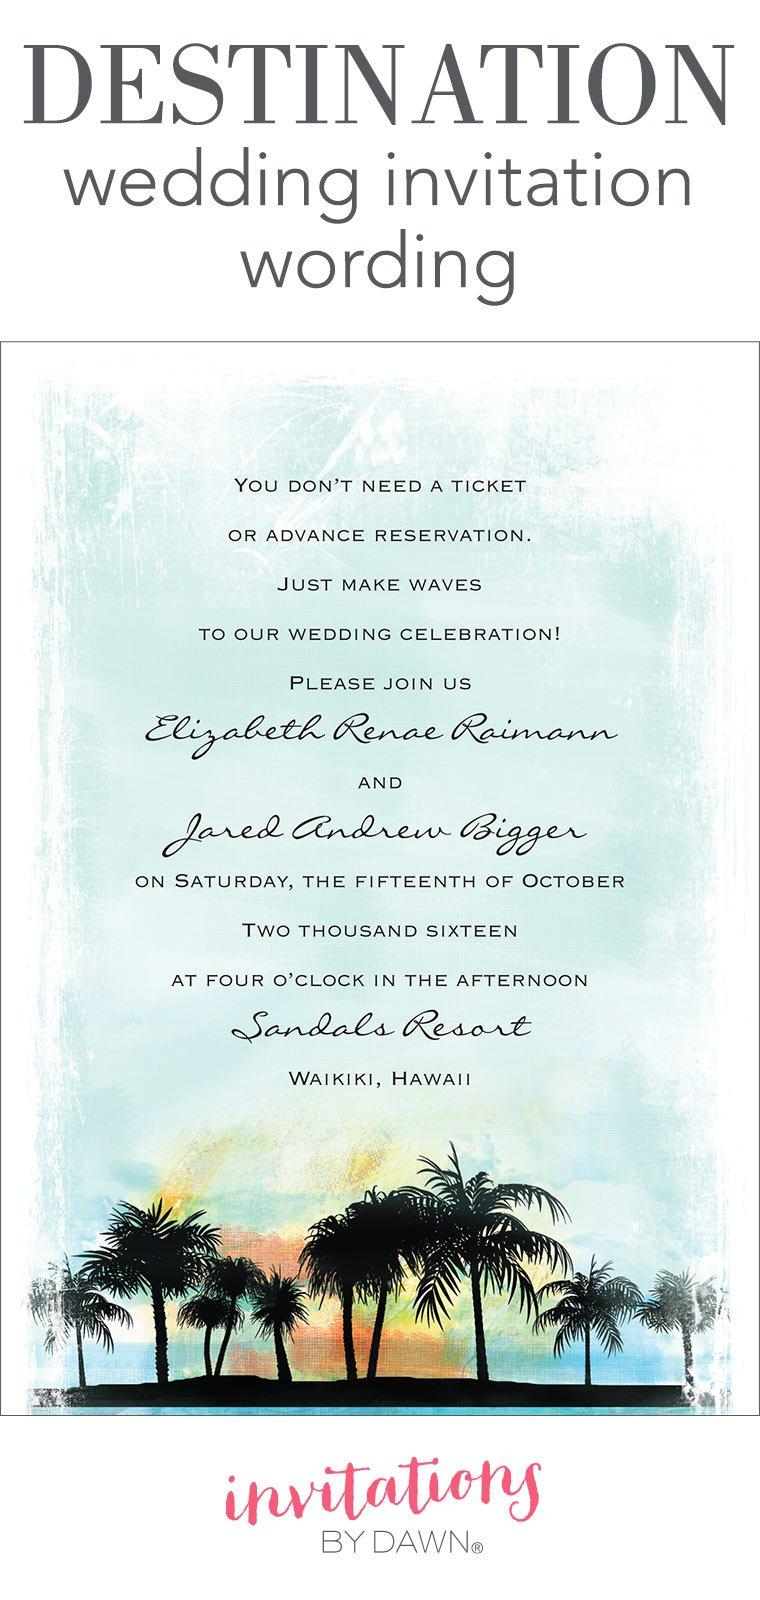 letterpress wedding invitations wolves in london